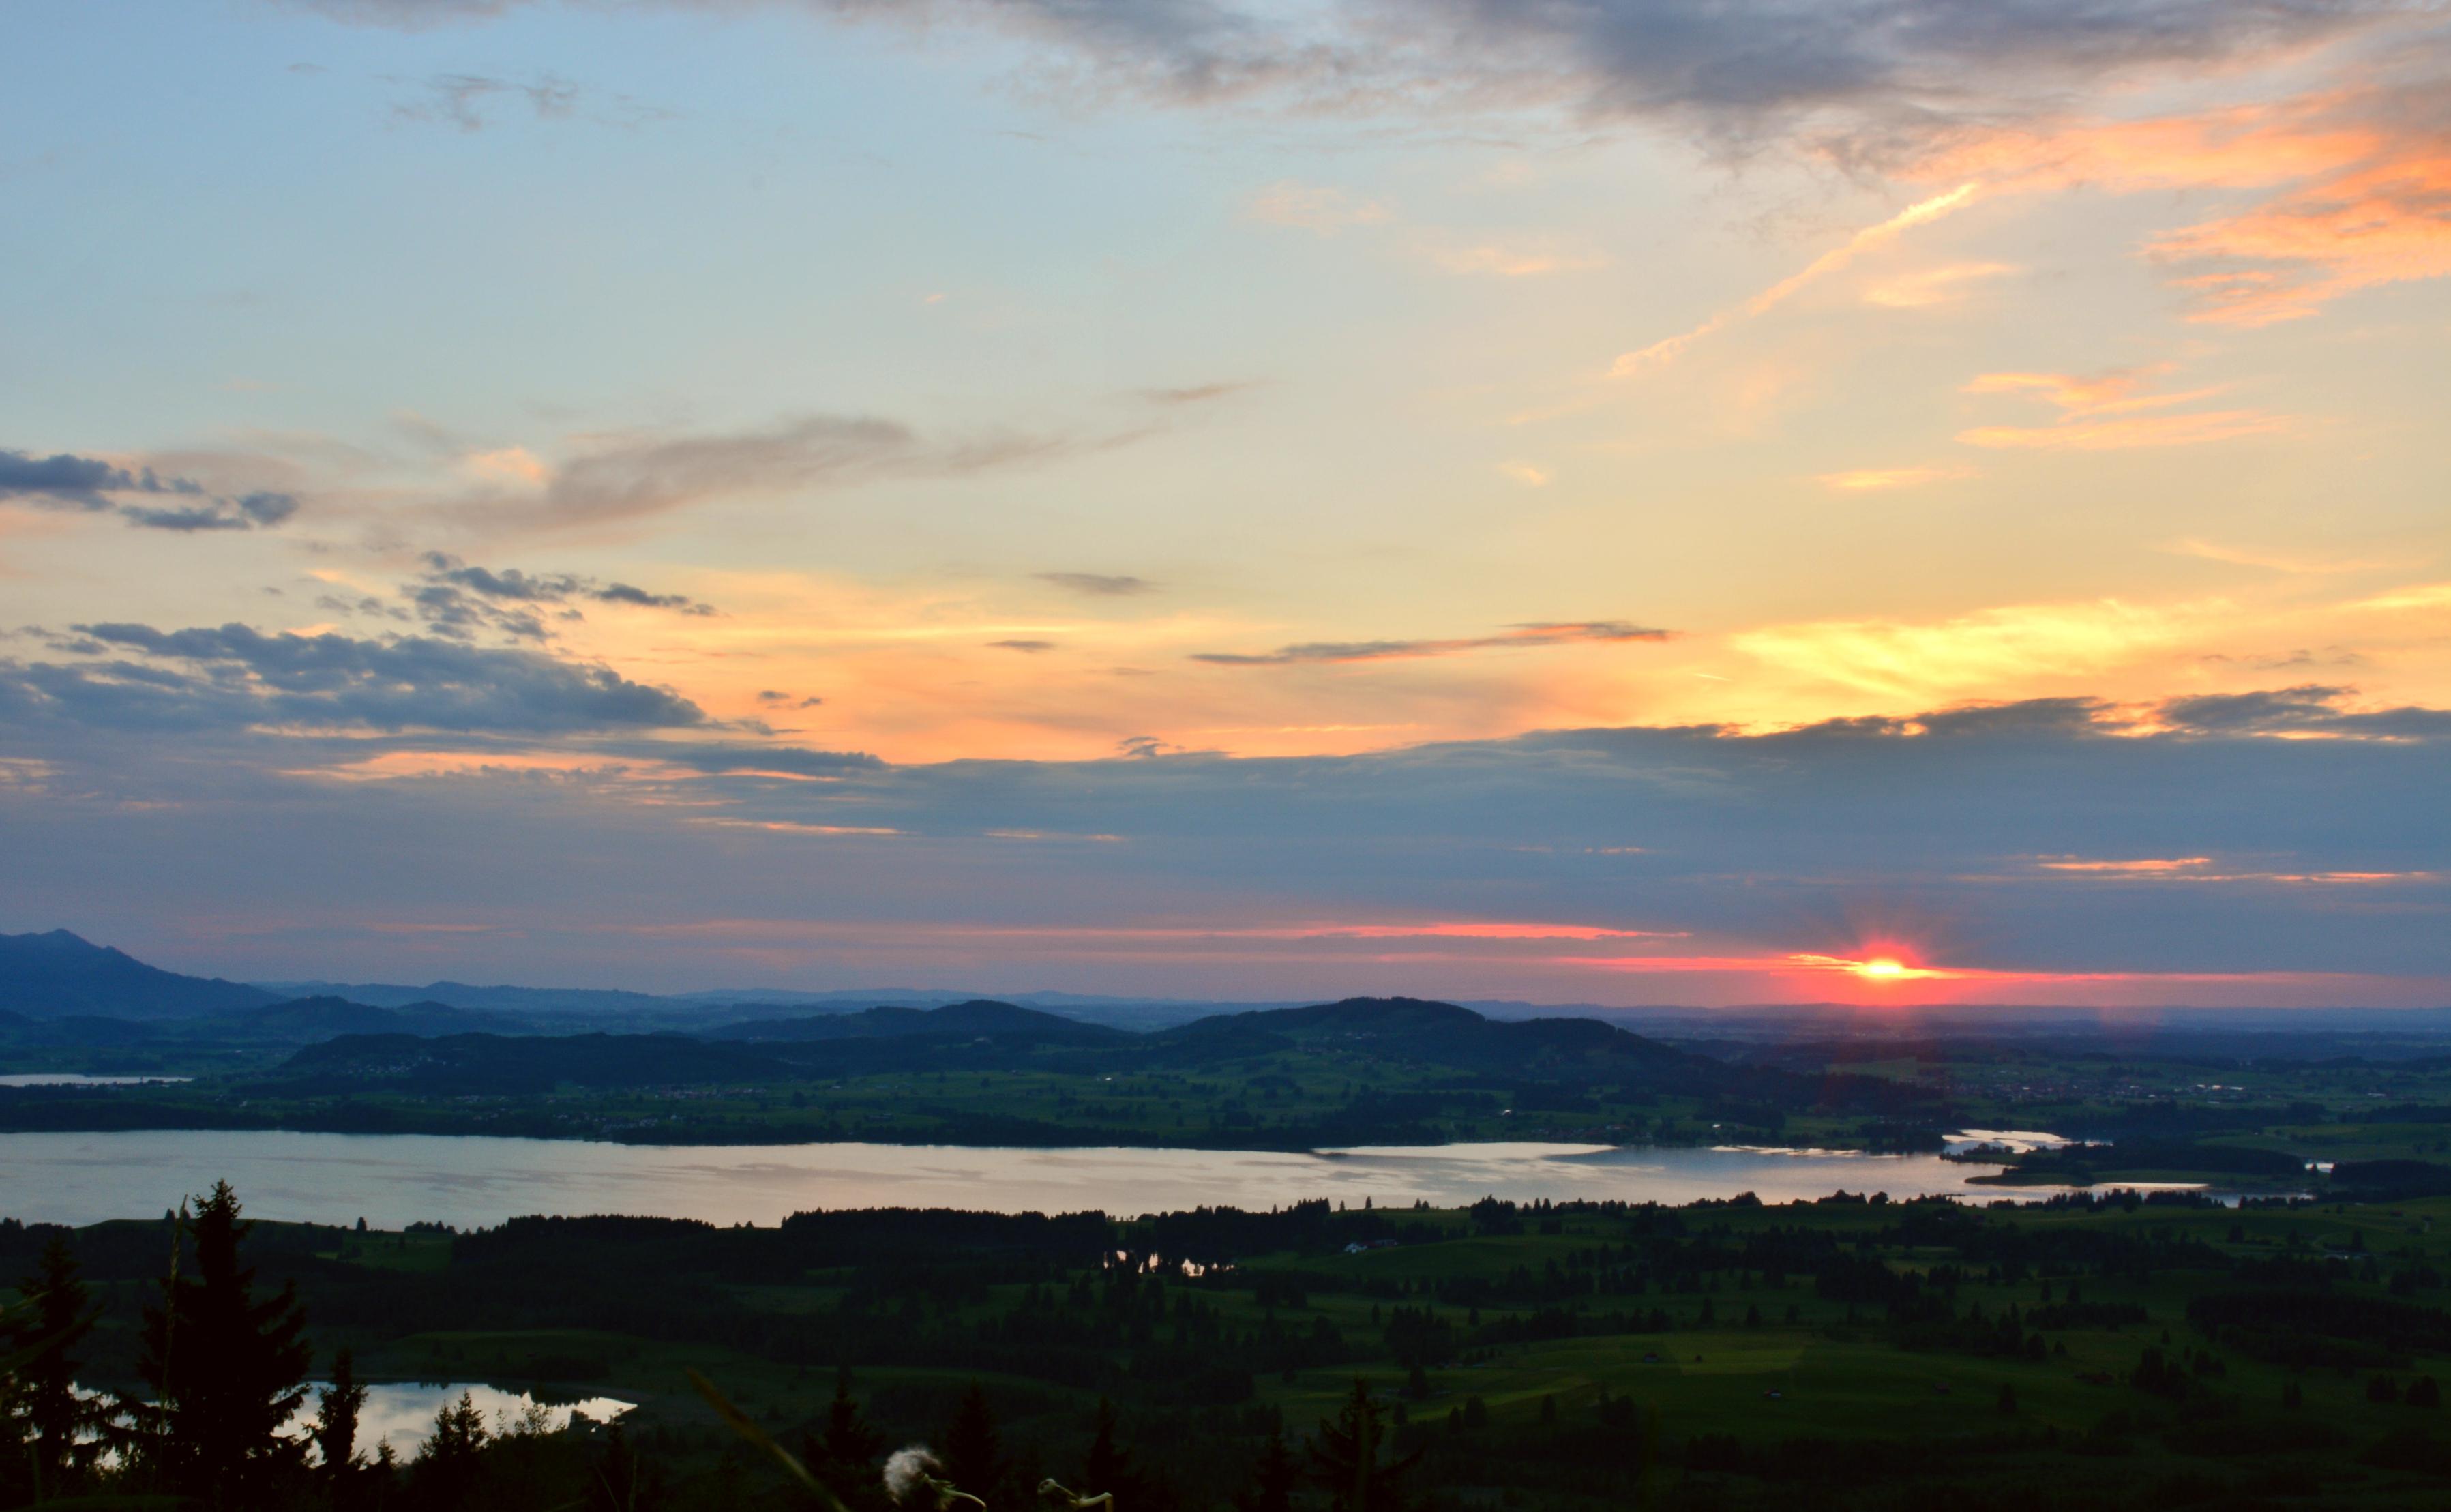 A0214 Sonnenuntergang vom Buchenberg.jpg